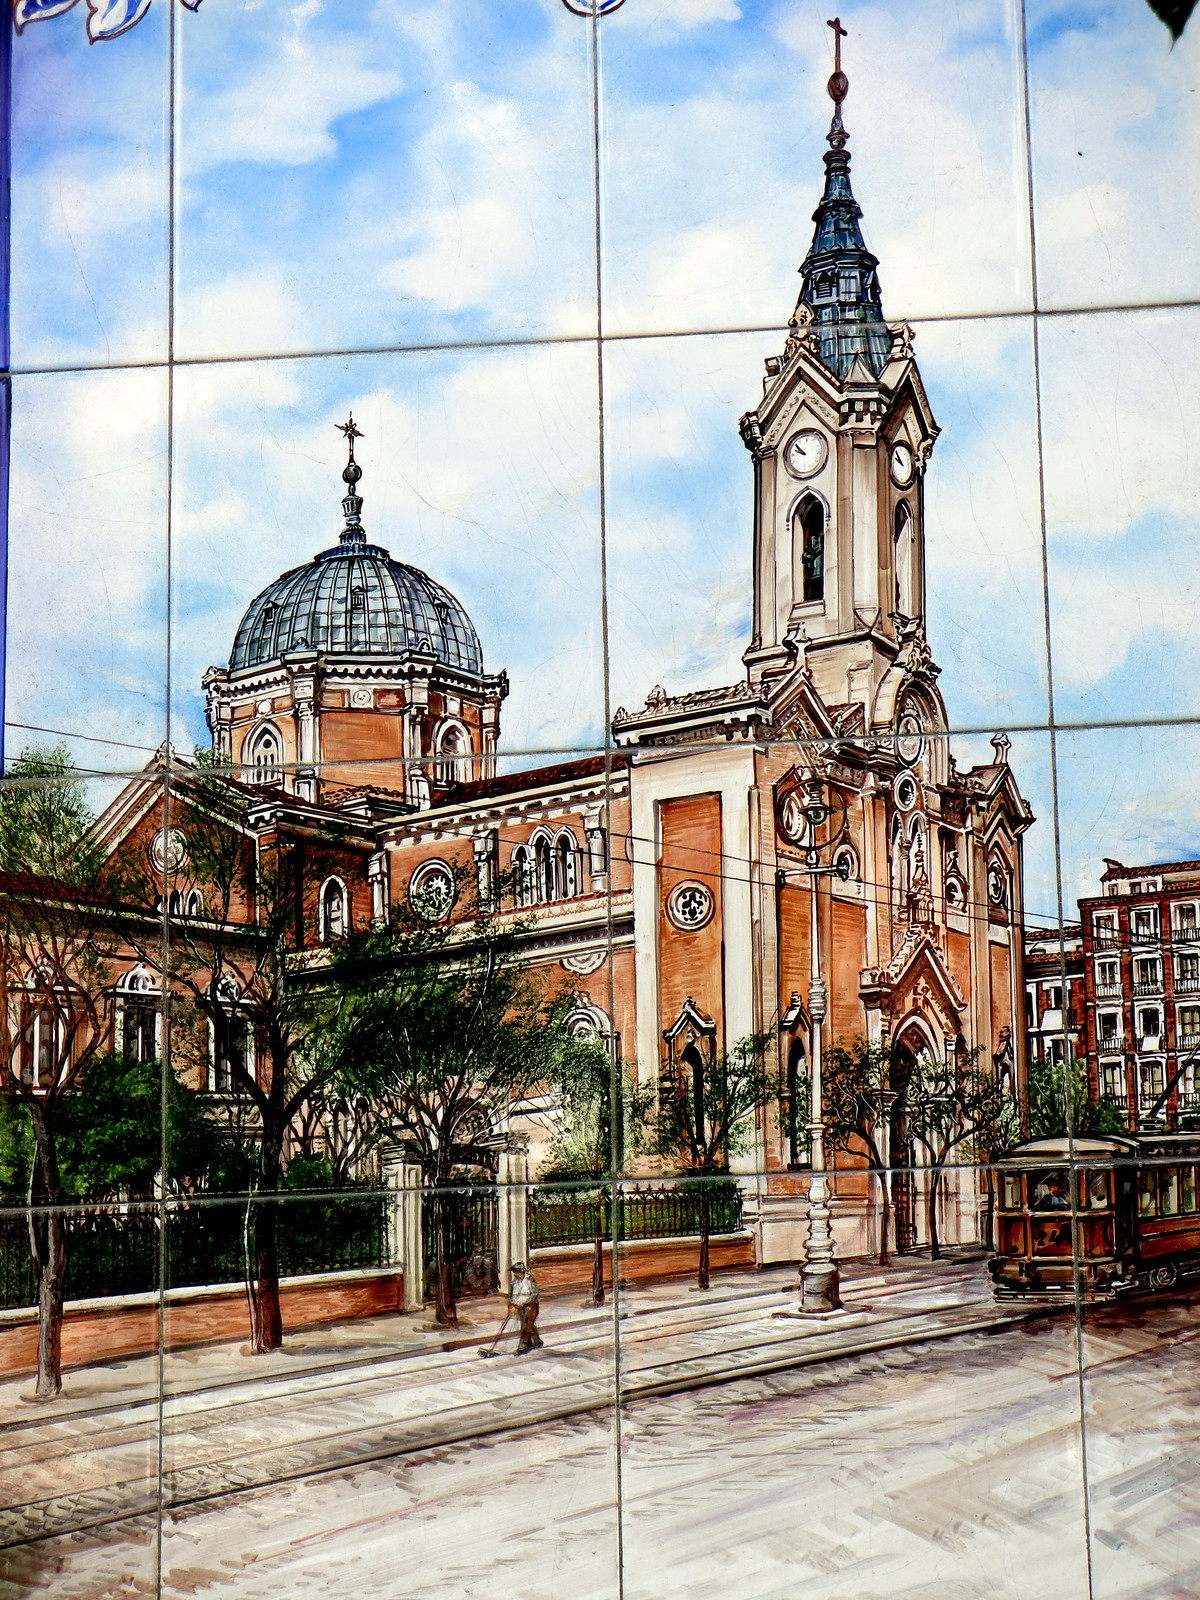 Penúltima iglesia del Buen Suceso de Madrid